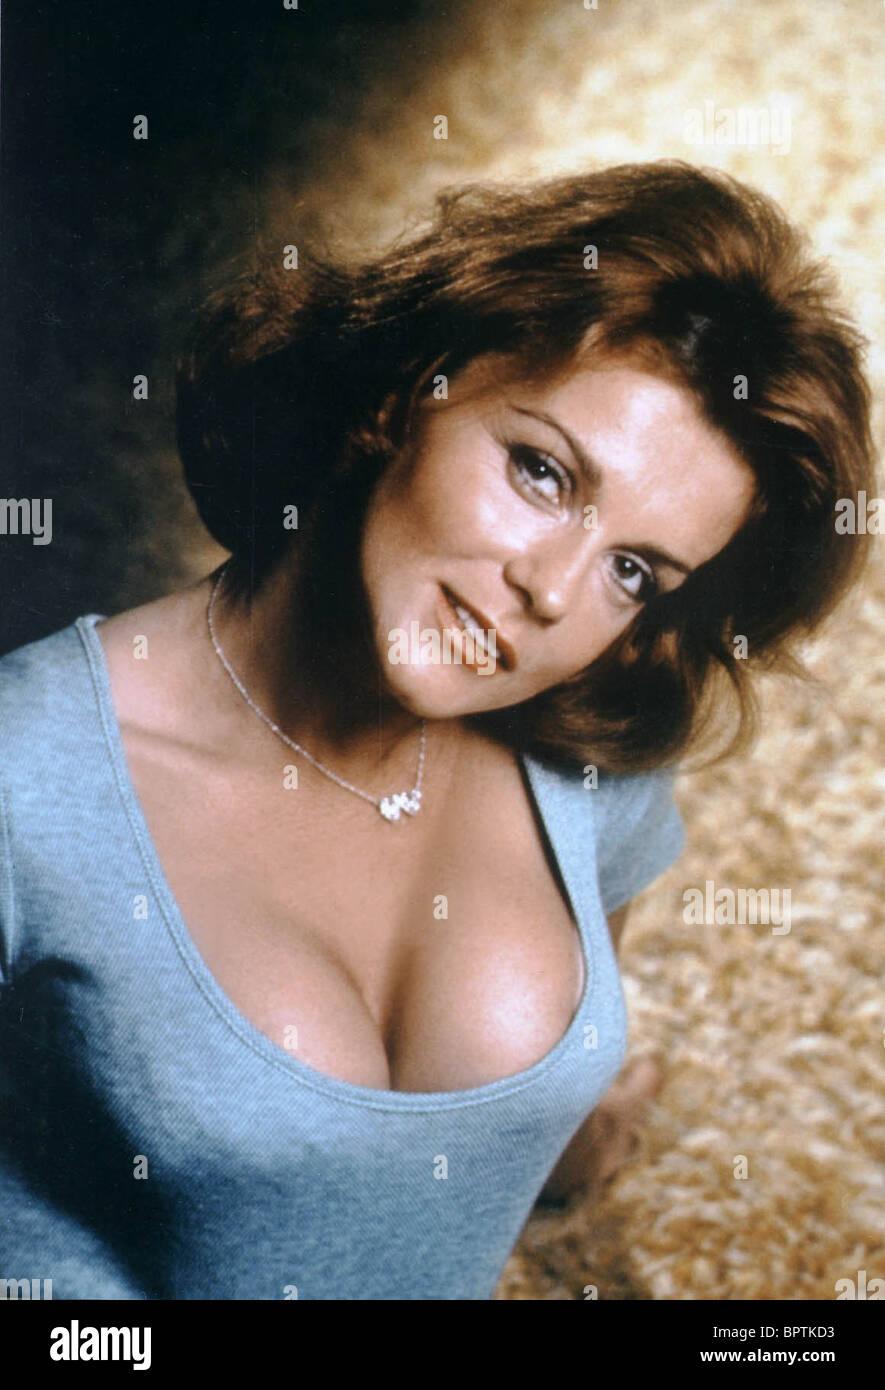 ANN-MARGRET ACTRESS (1988) - Stock Image